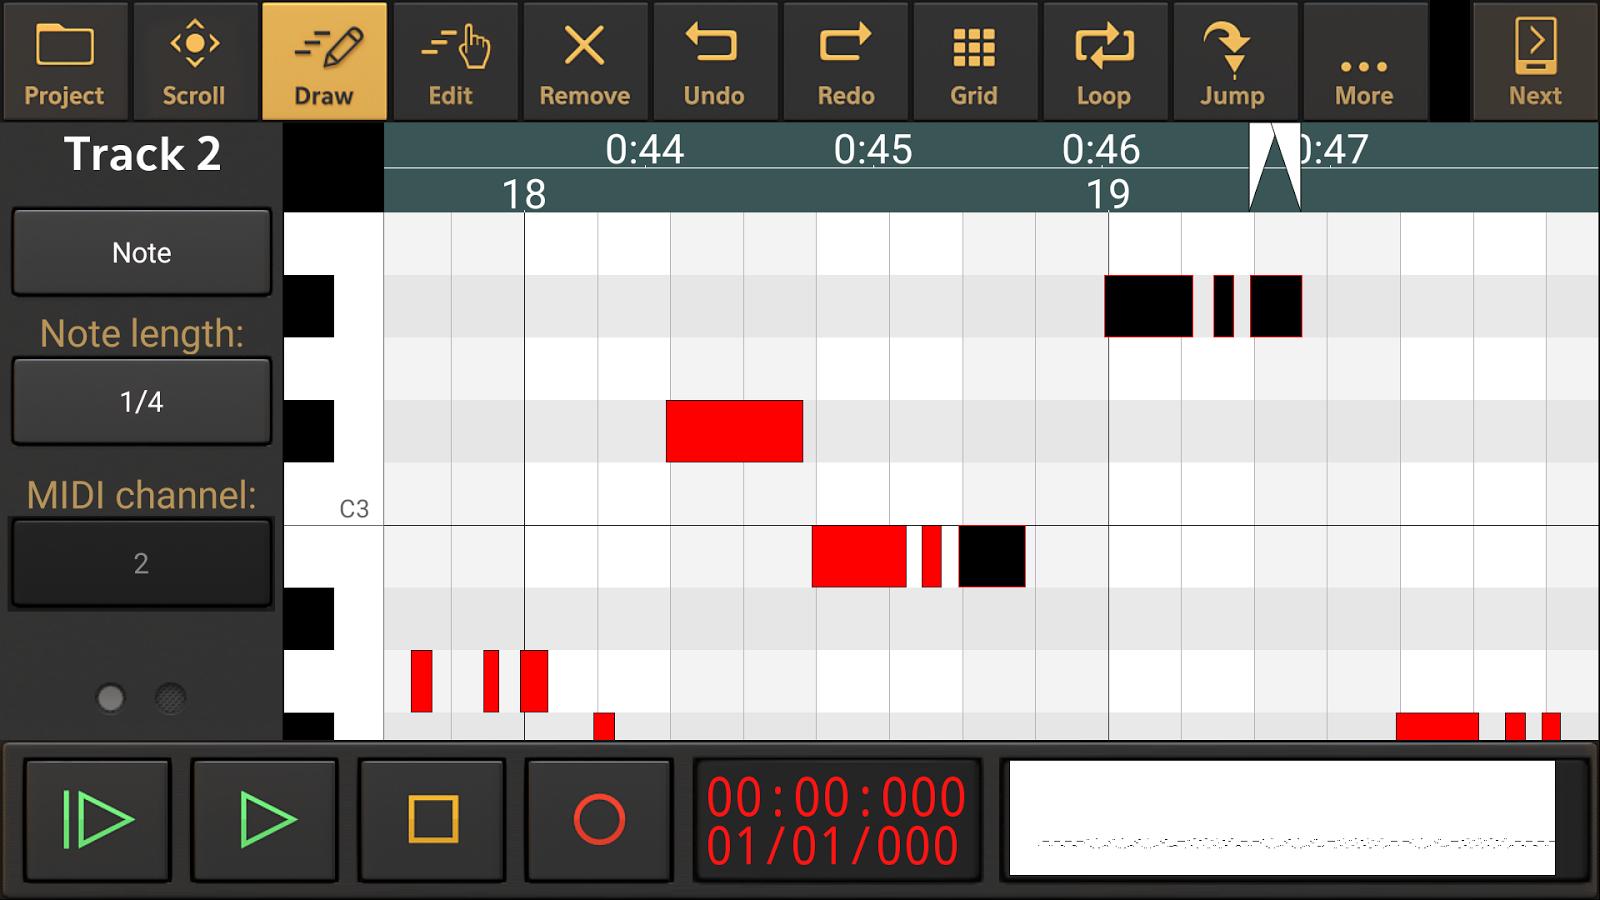 Lexis audio editor pro apk download - rohsbludwarteu